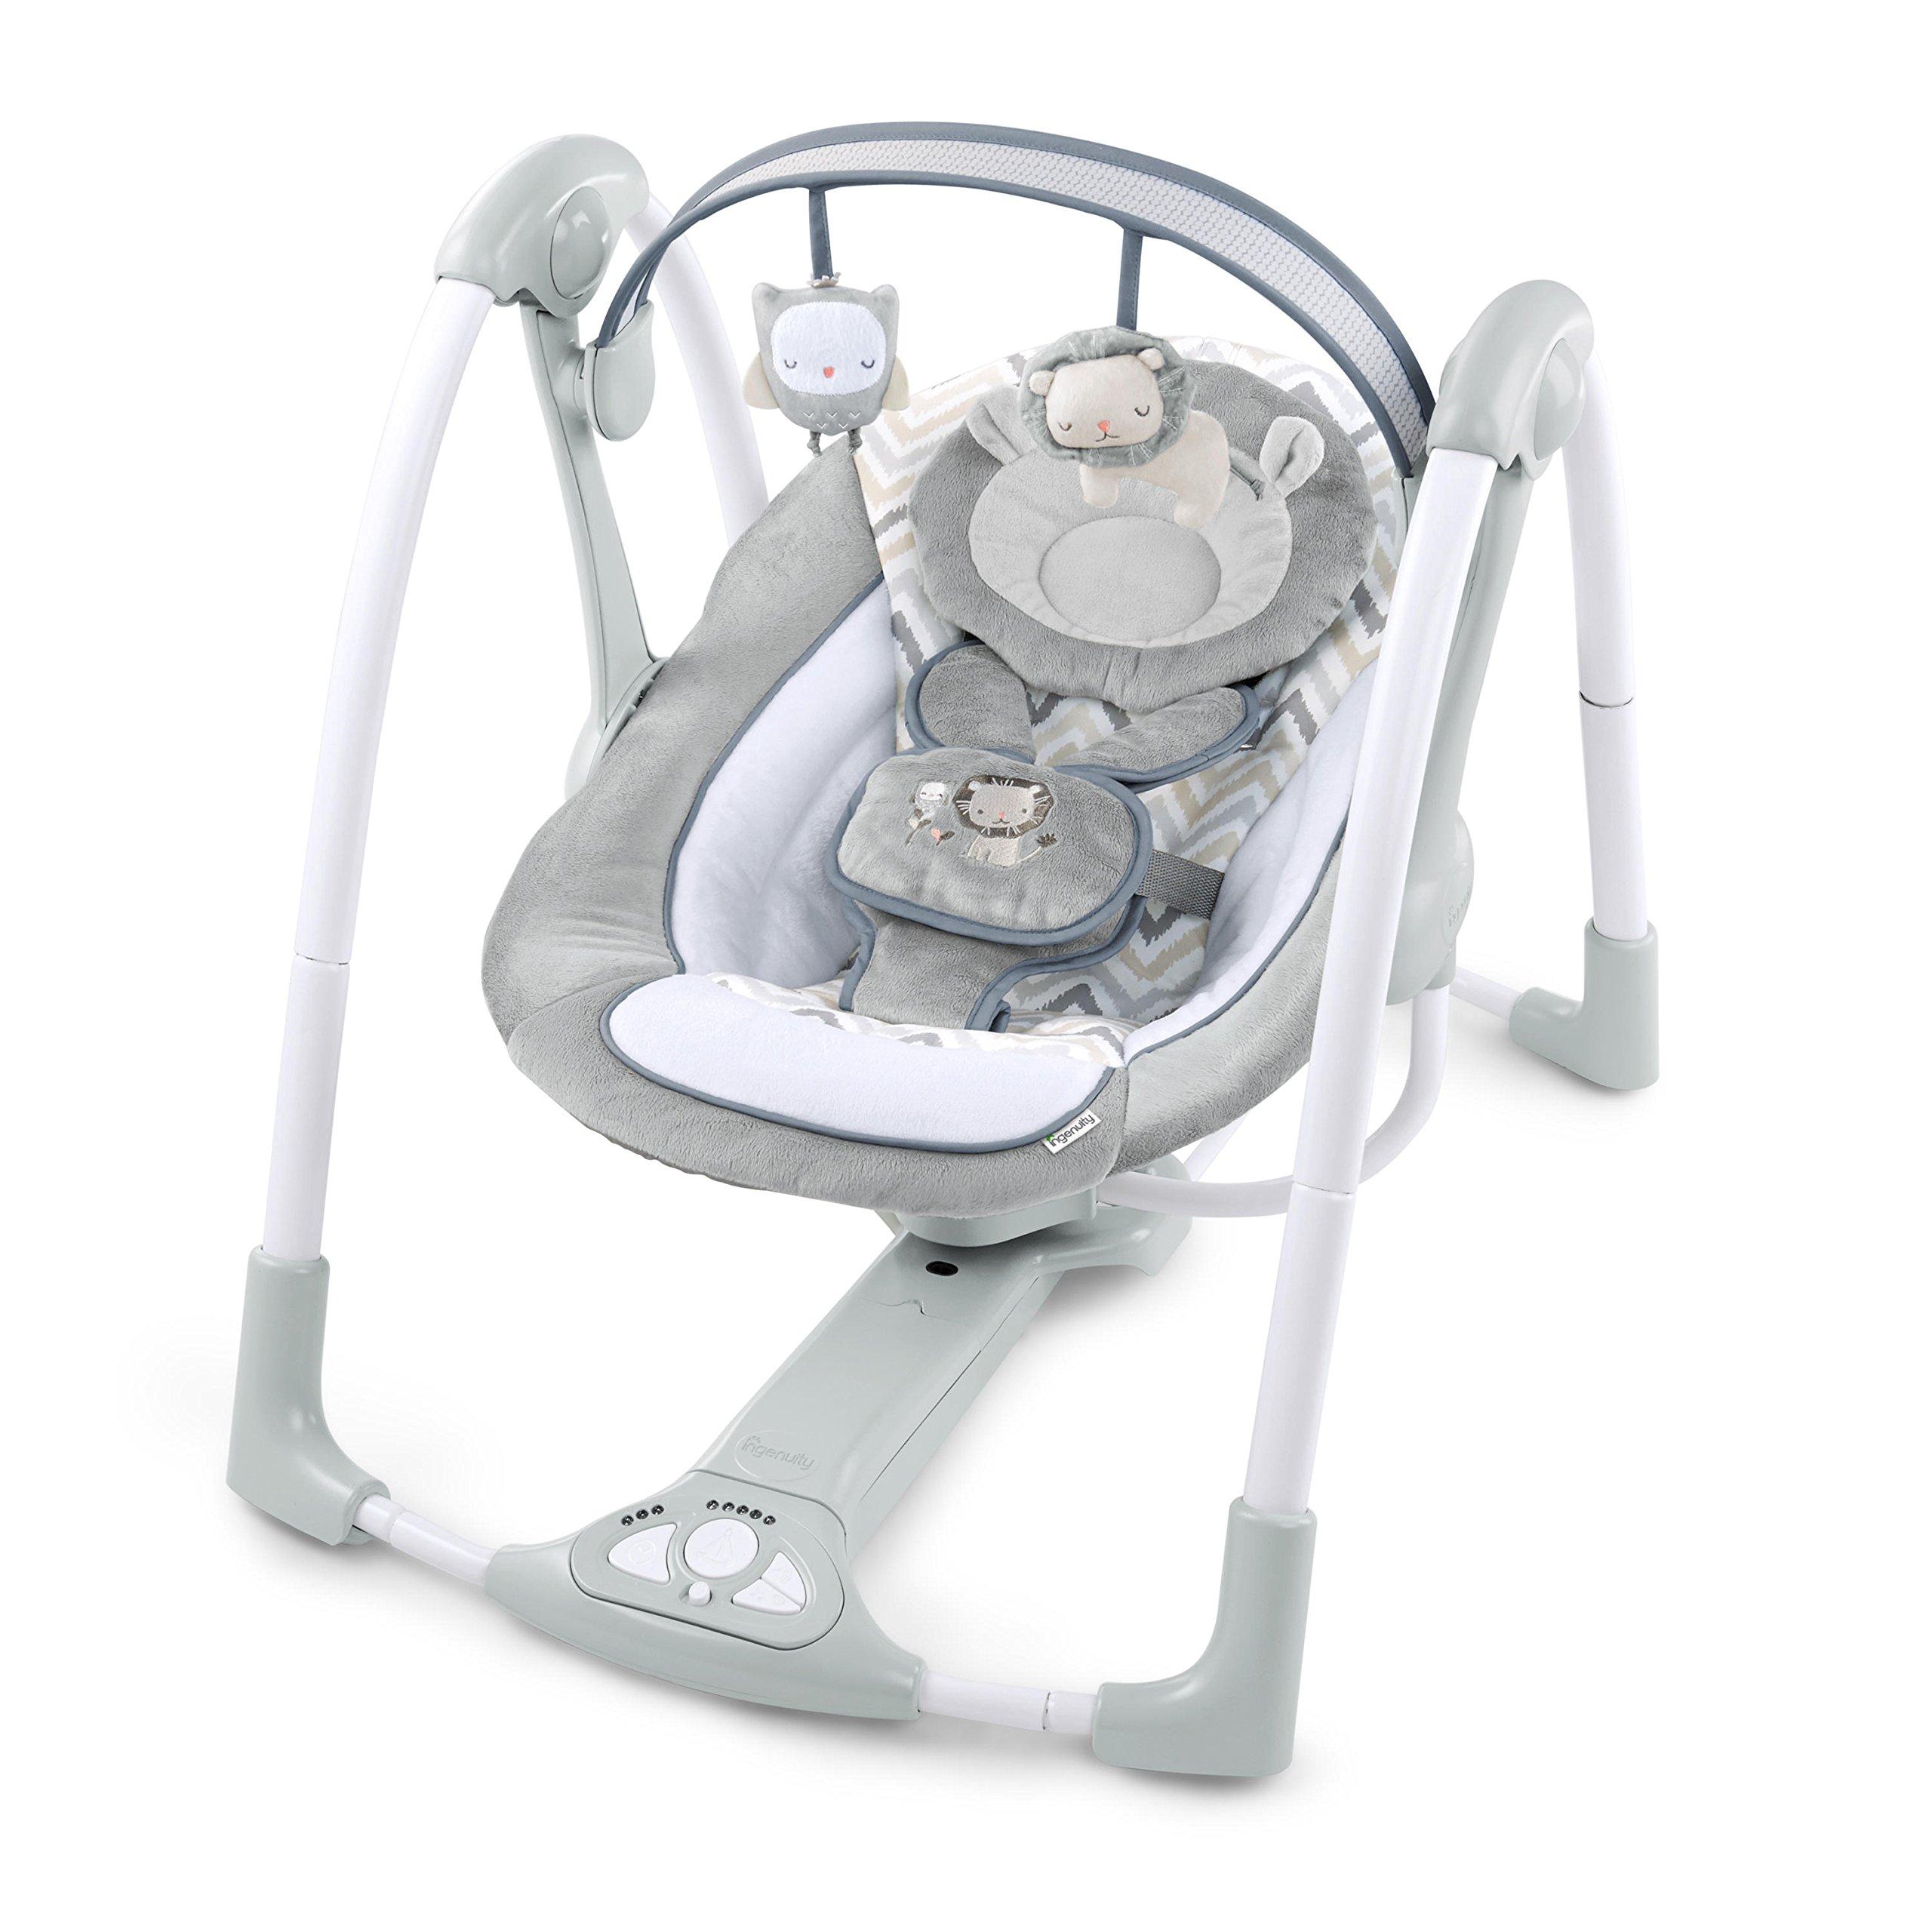 Ingenuity Power Adapt Portable Swing